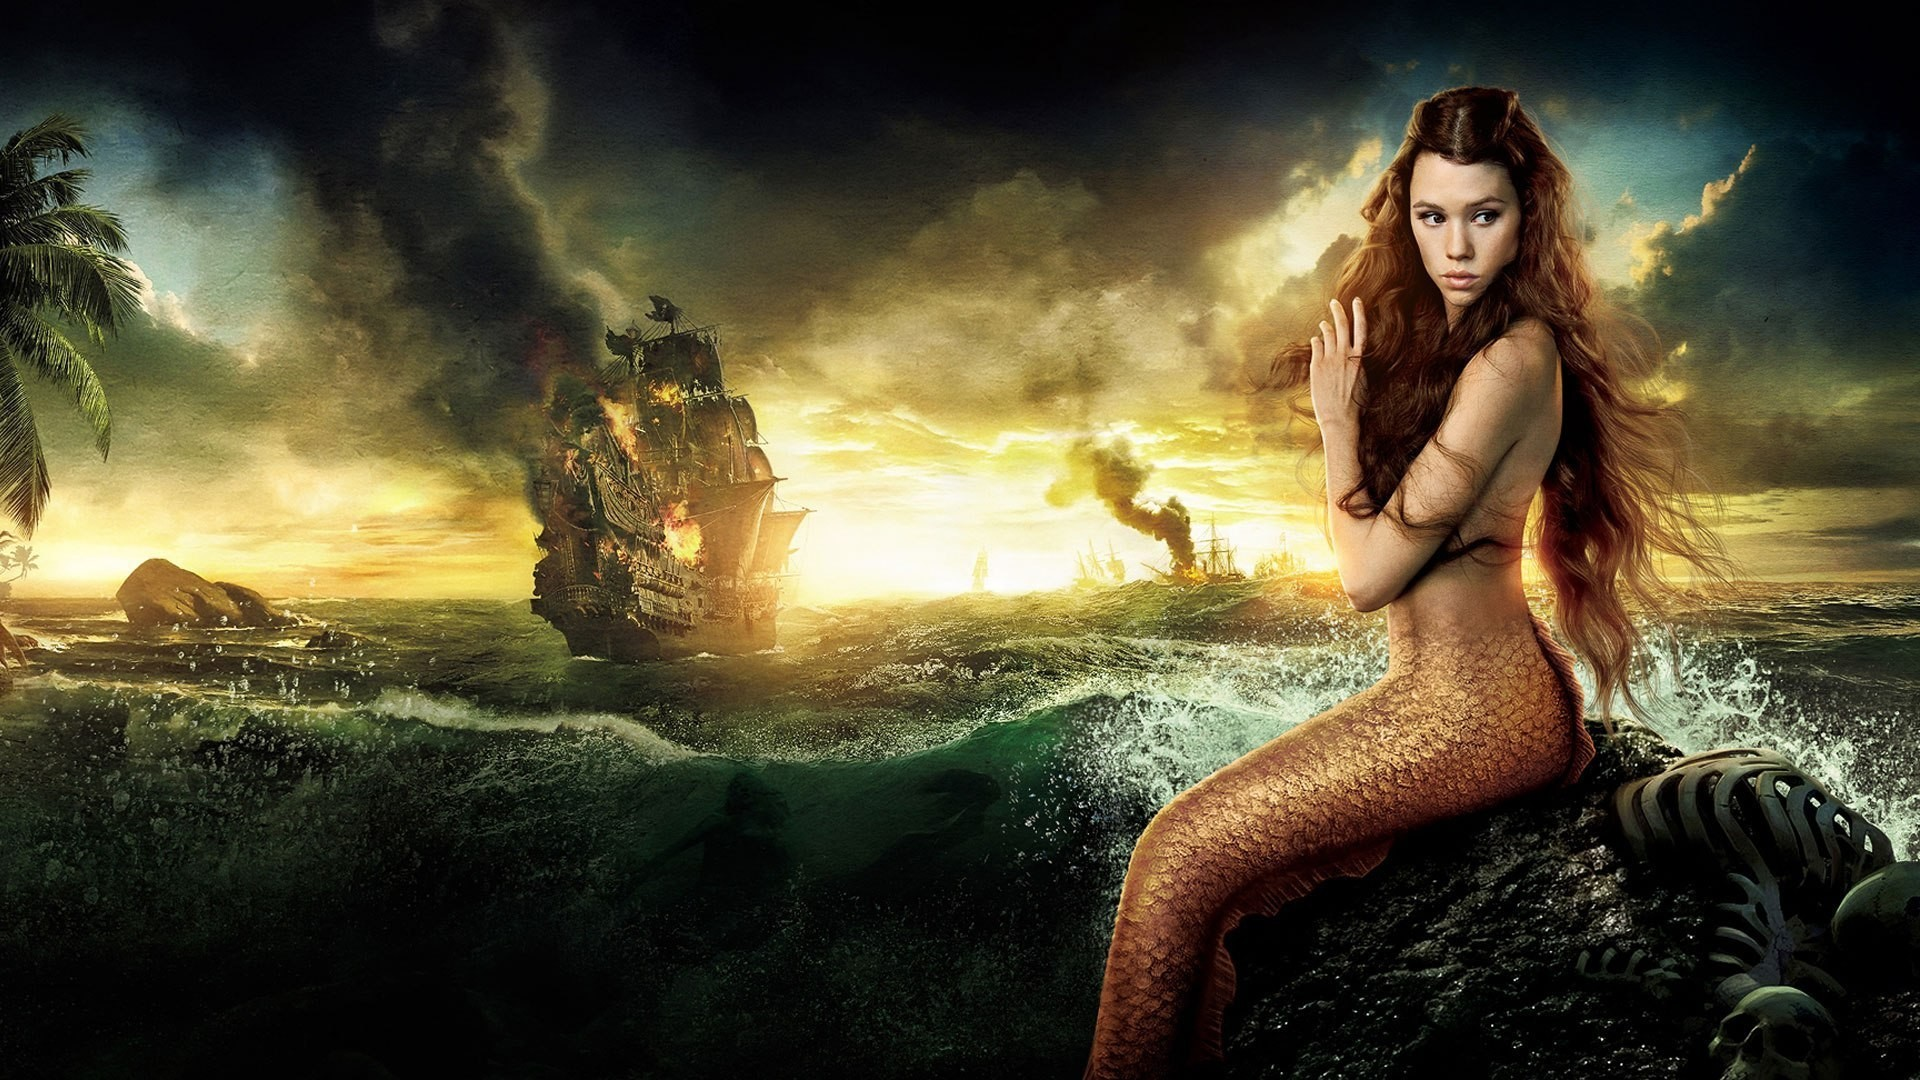 Free Wallpapers – Pirates Of The Caribbean Mermaids Wallpaper